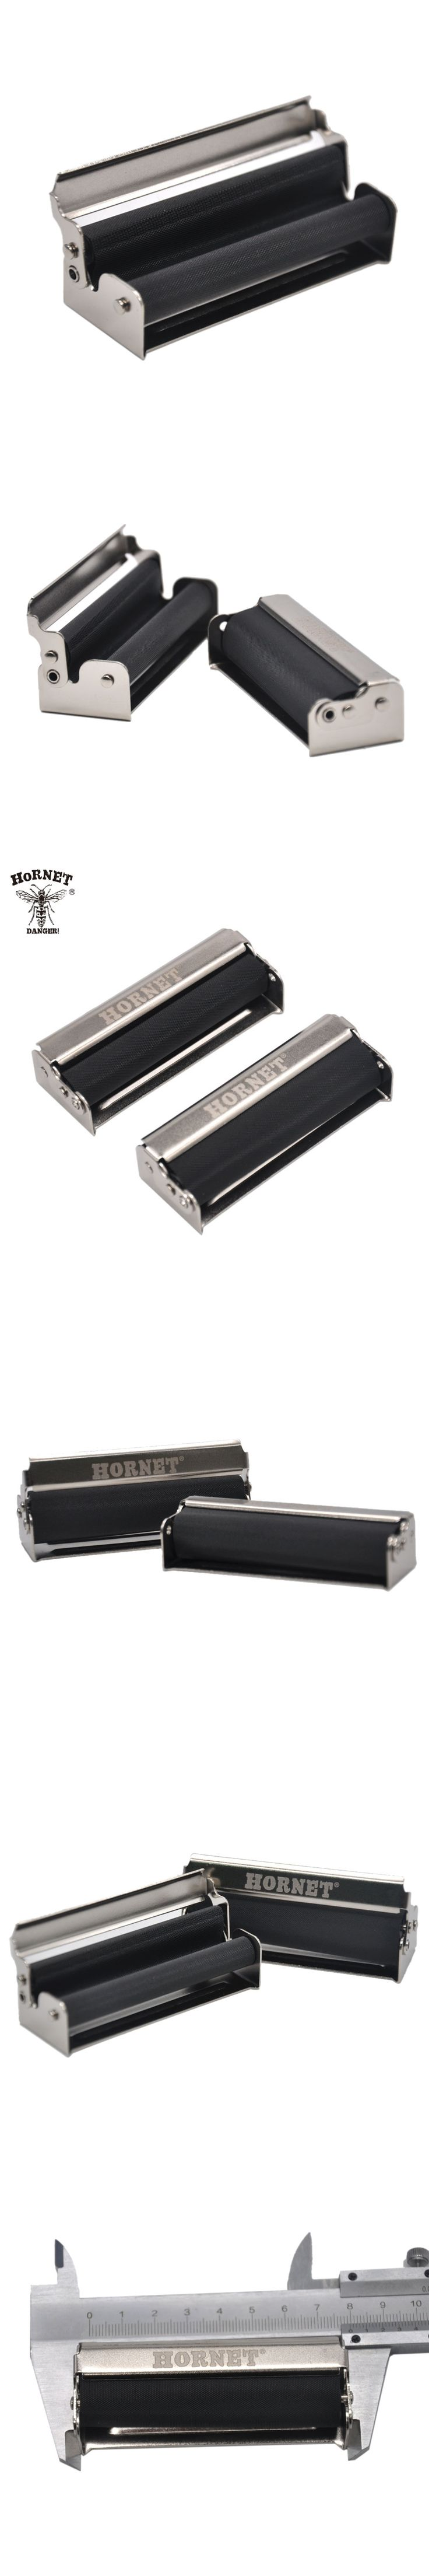 [HORNET] Unique 70/78MM Portable Hand Roller Metal Cigarette Rolling Machine Cigarette Maker Roller For  Rolling Papers